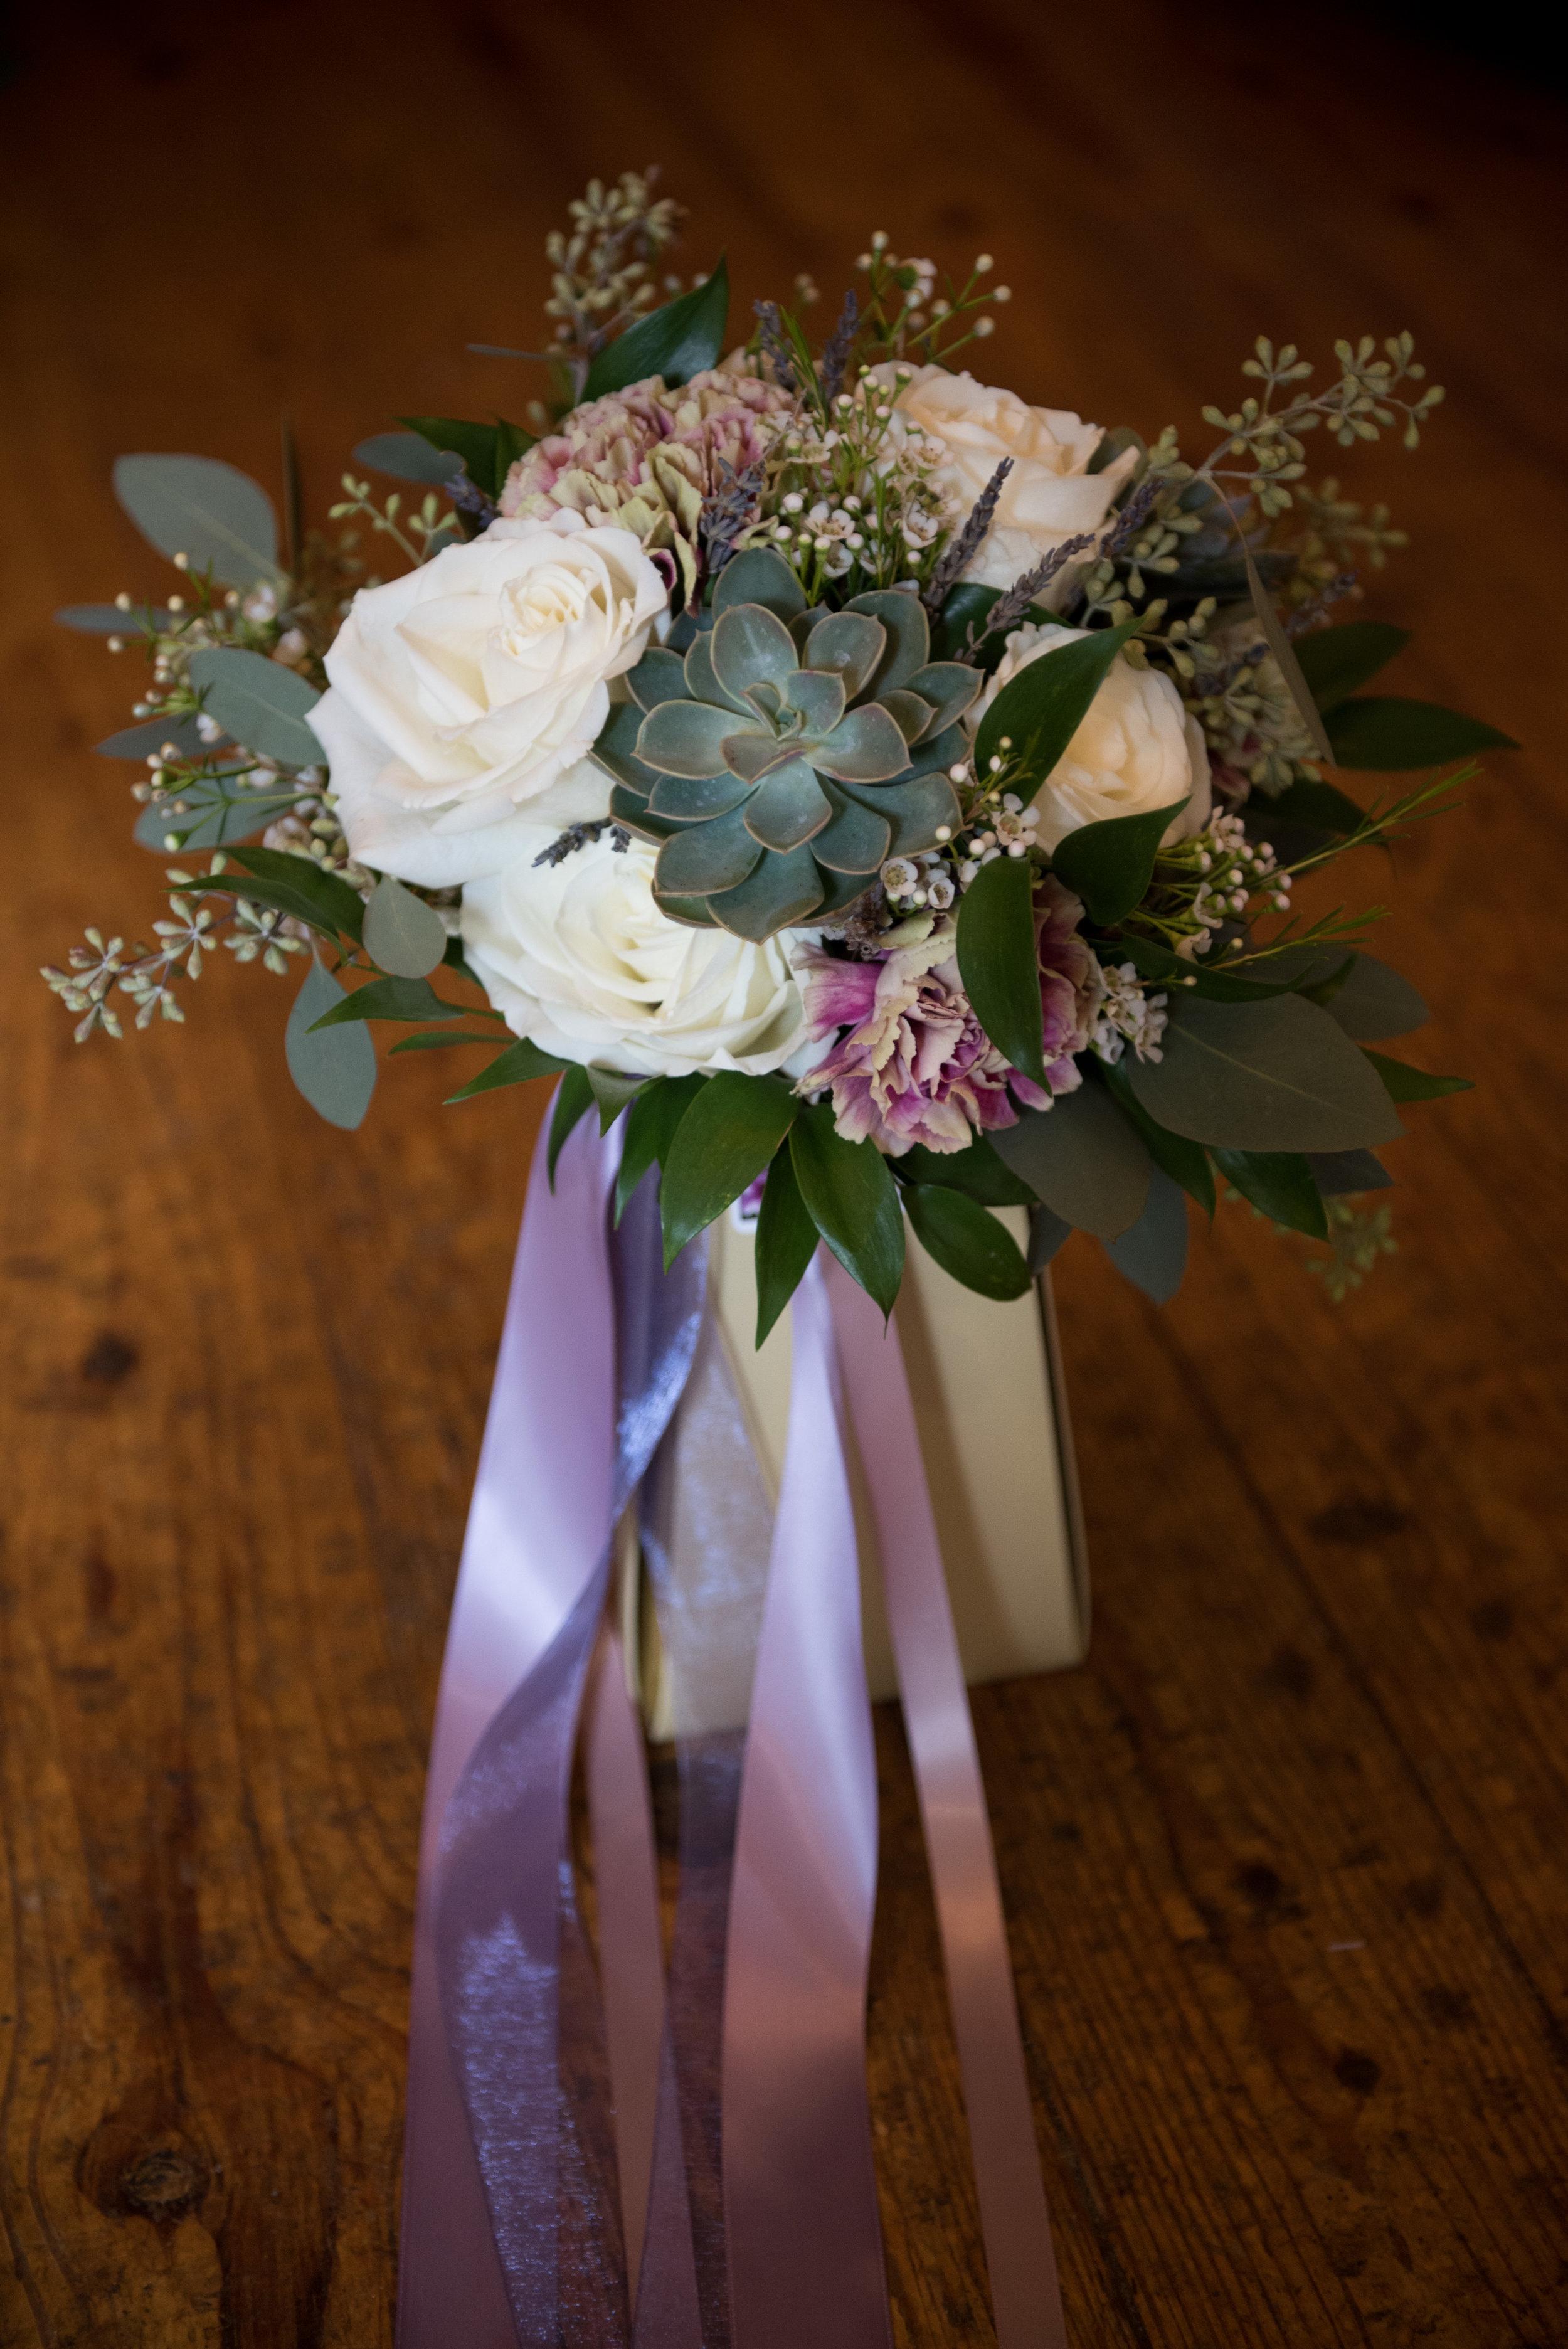 Succulent, rose & antique carnation bouquet. Rose of Sharon Floral Designs